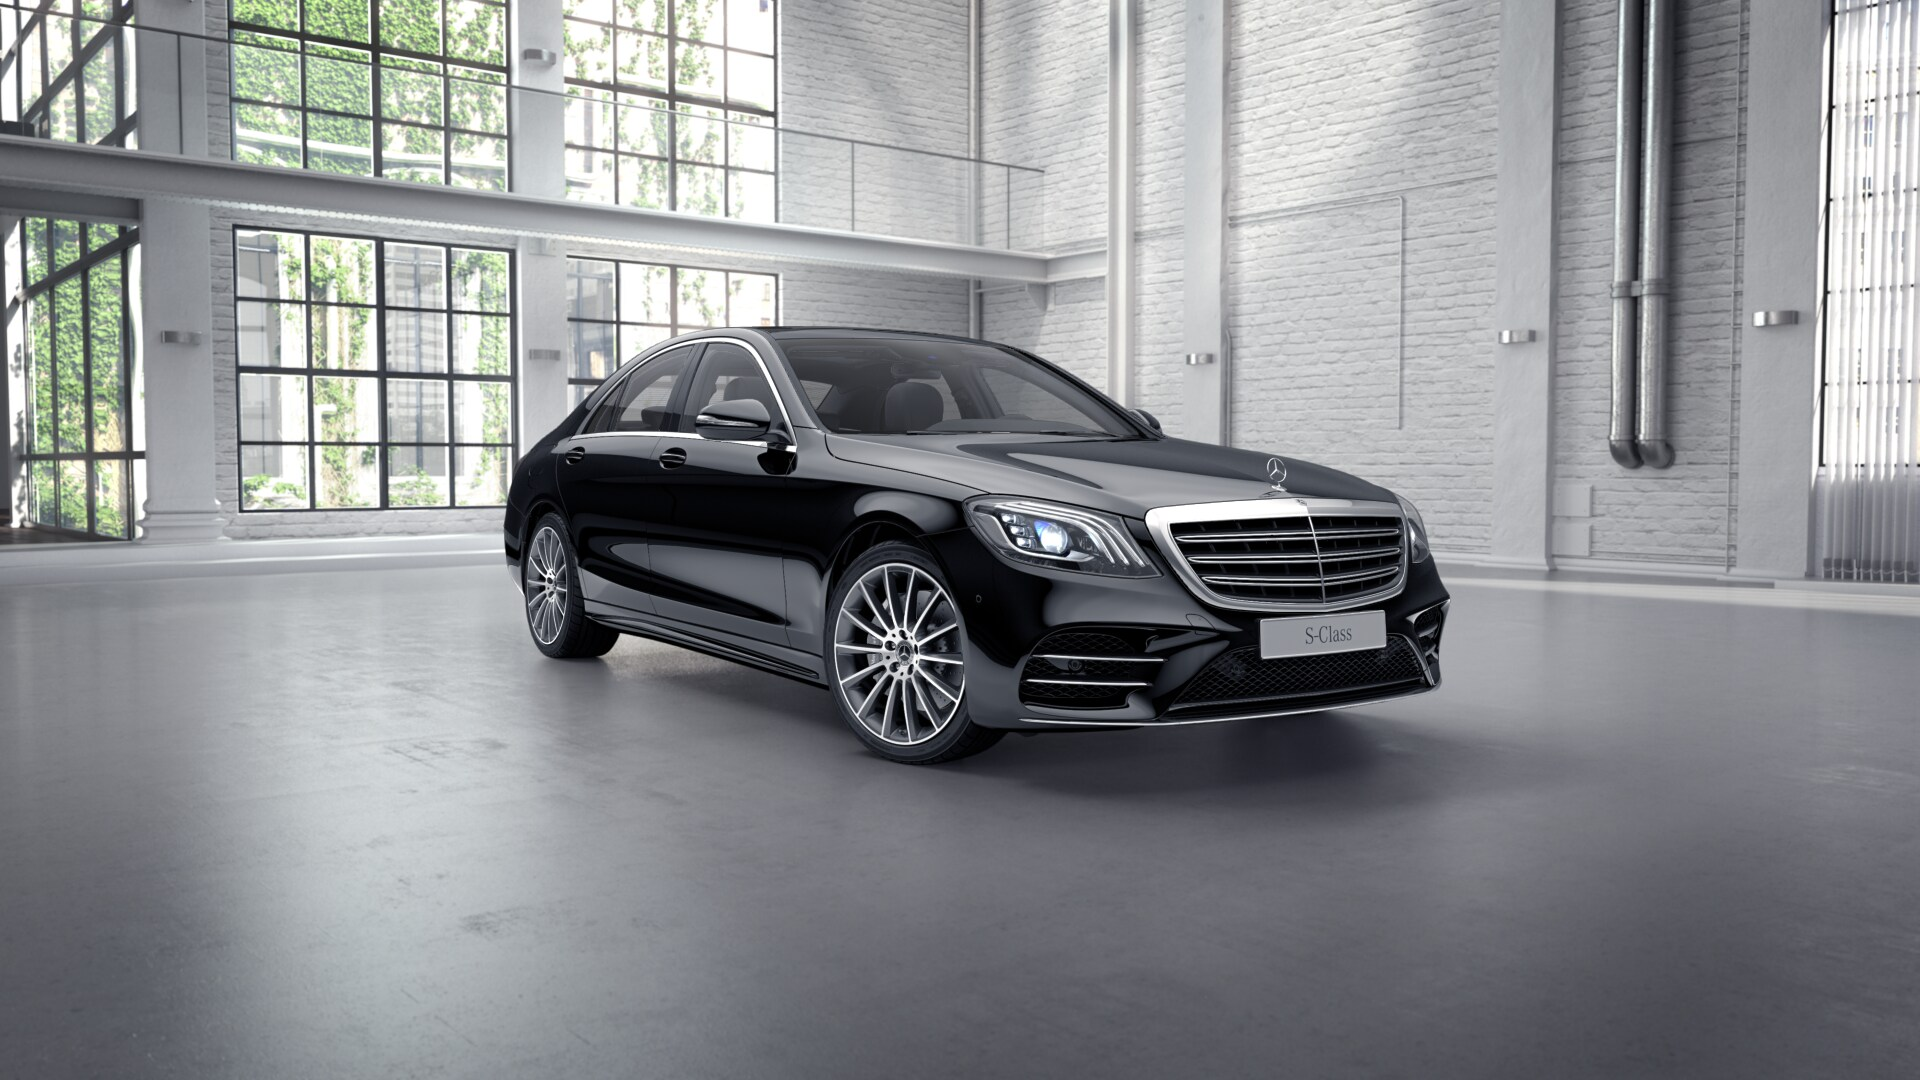 Mercedes-Benz S-Class Limousine 0852611132